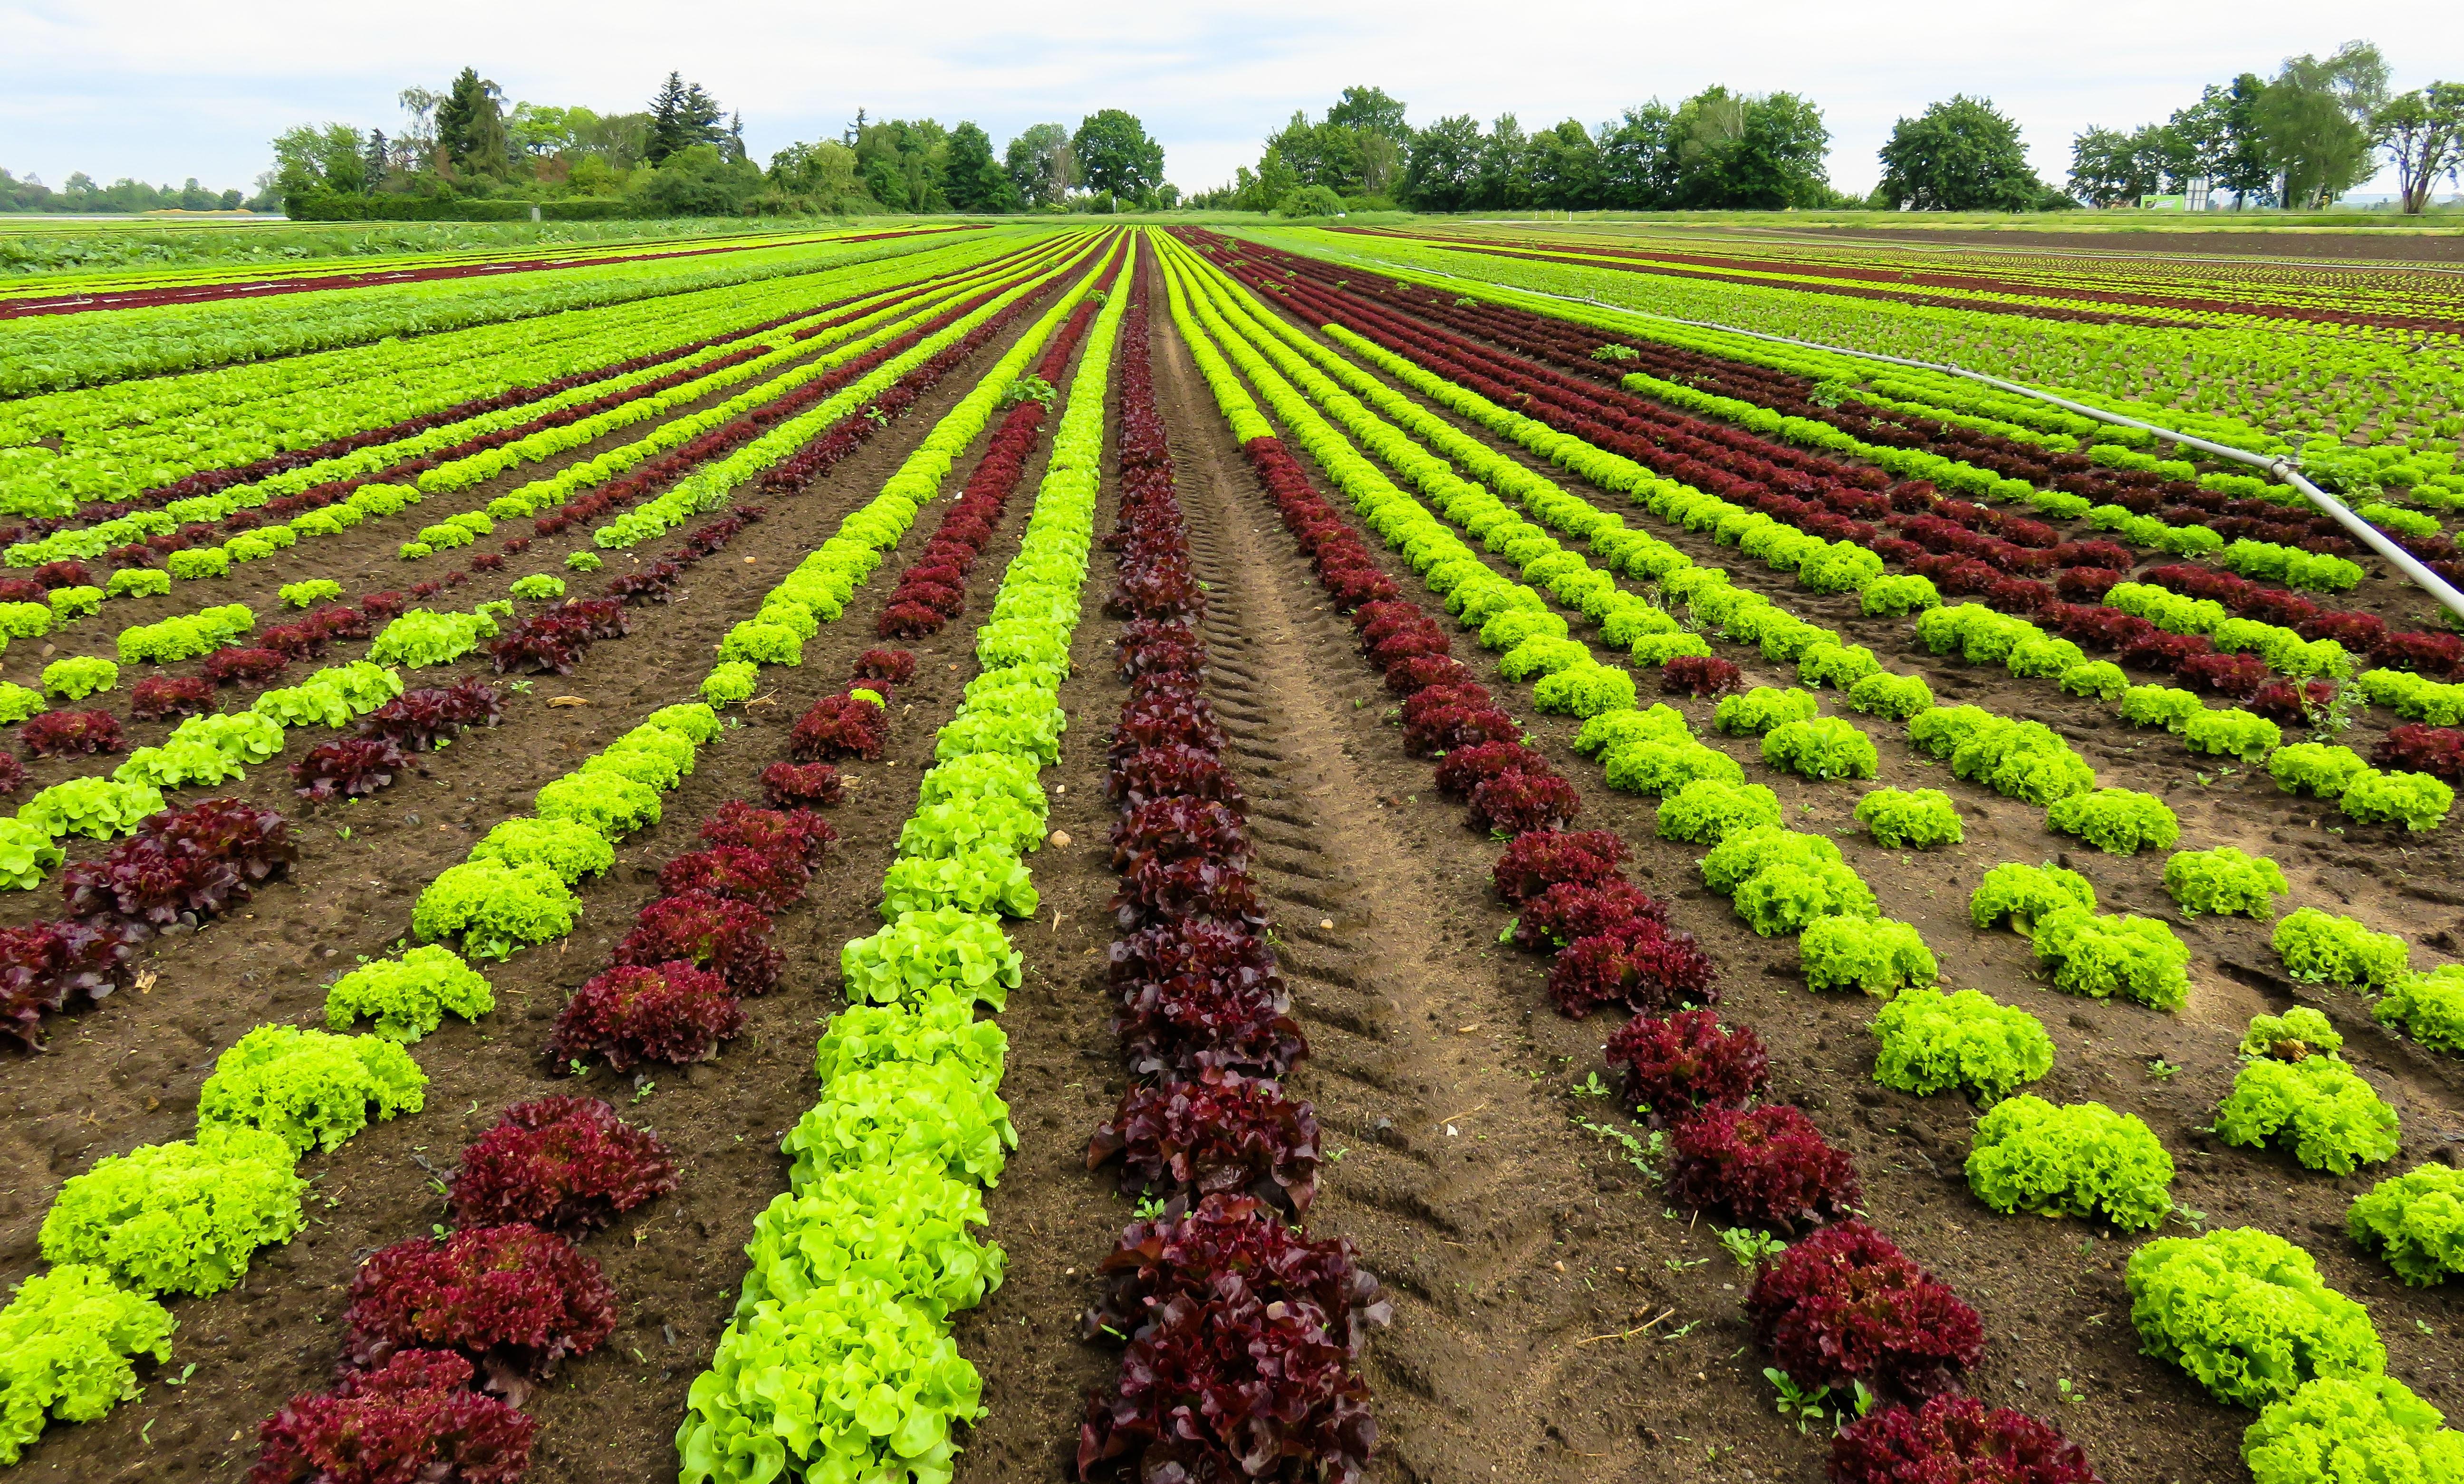 Wallpaper Bidang Sayuran Tanah Pertanian Selada Bunga